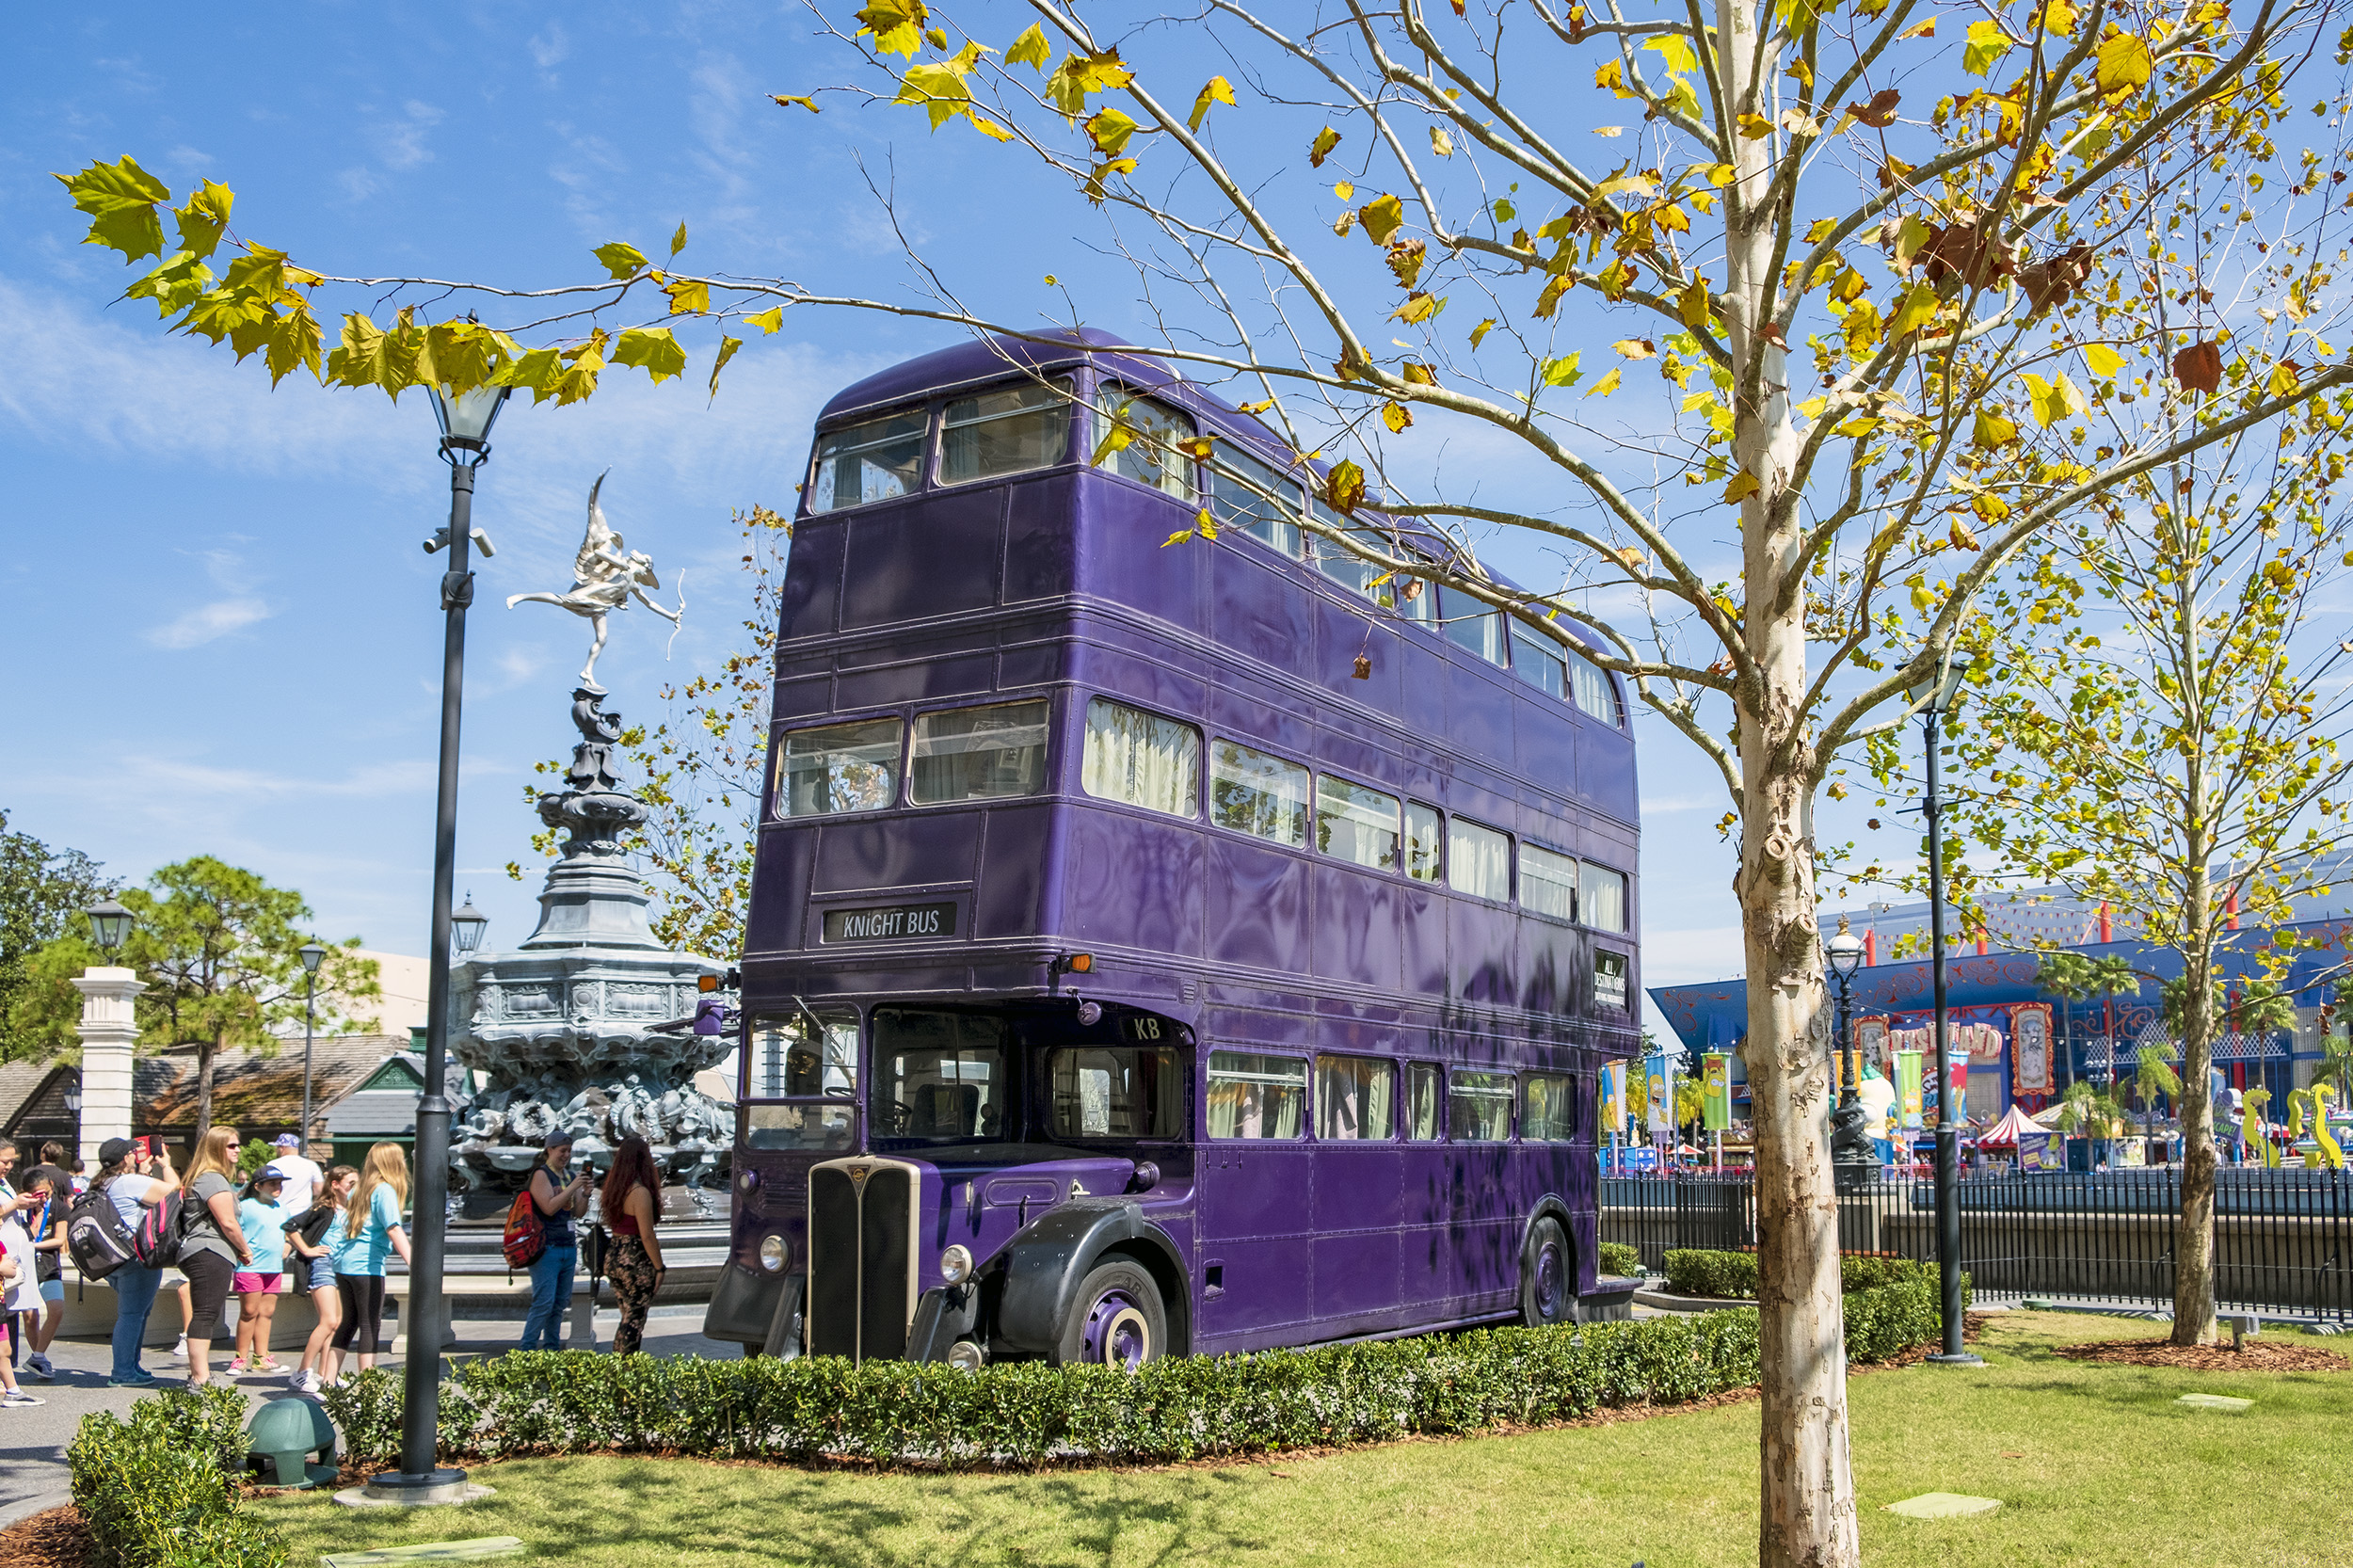 The Knight Bus utanför Diagon Alley. The Wizarding World of Harry Potter